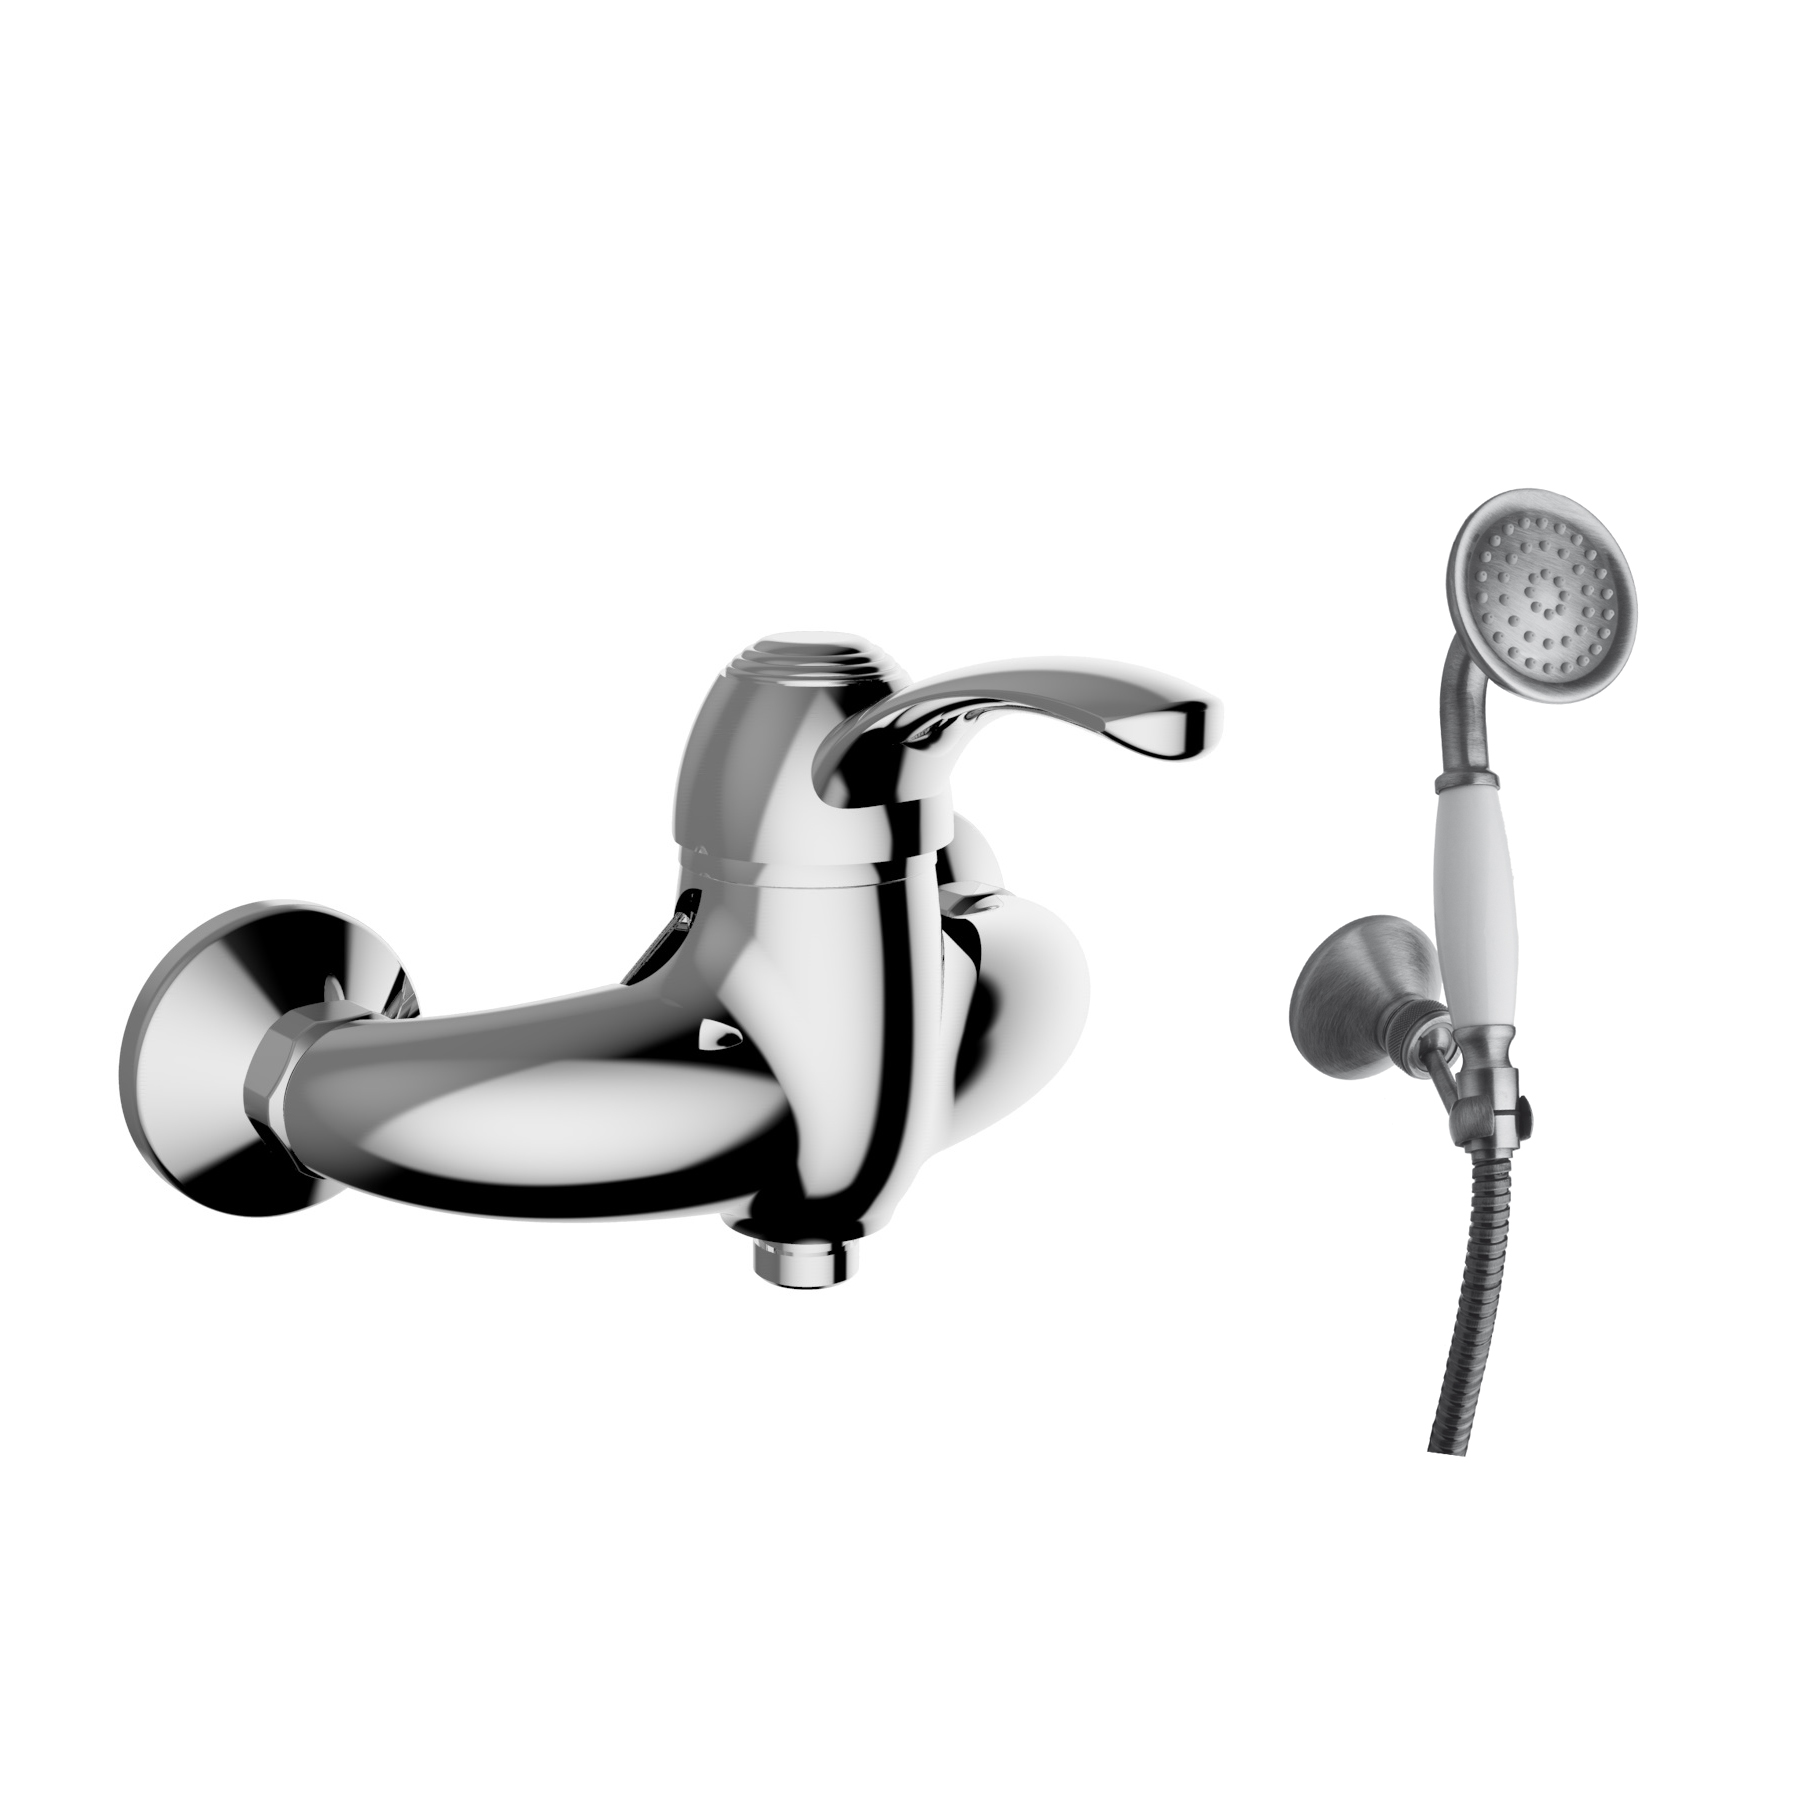 Immagine HD JAR 2 shower mixer